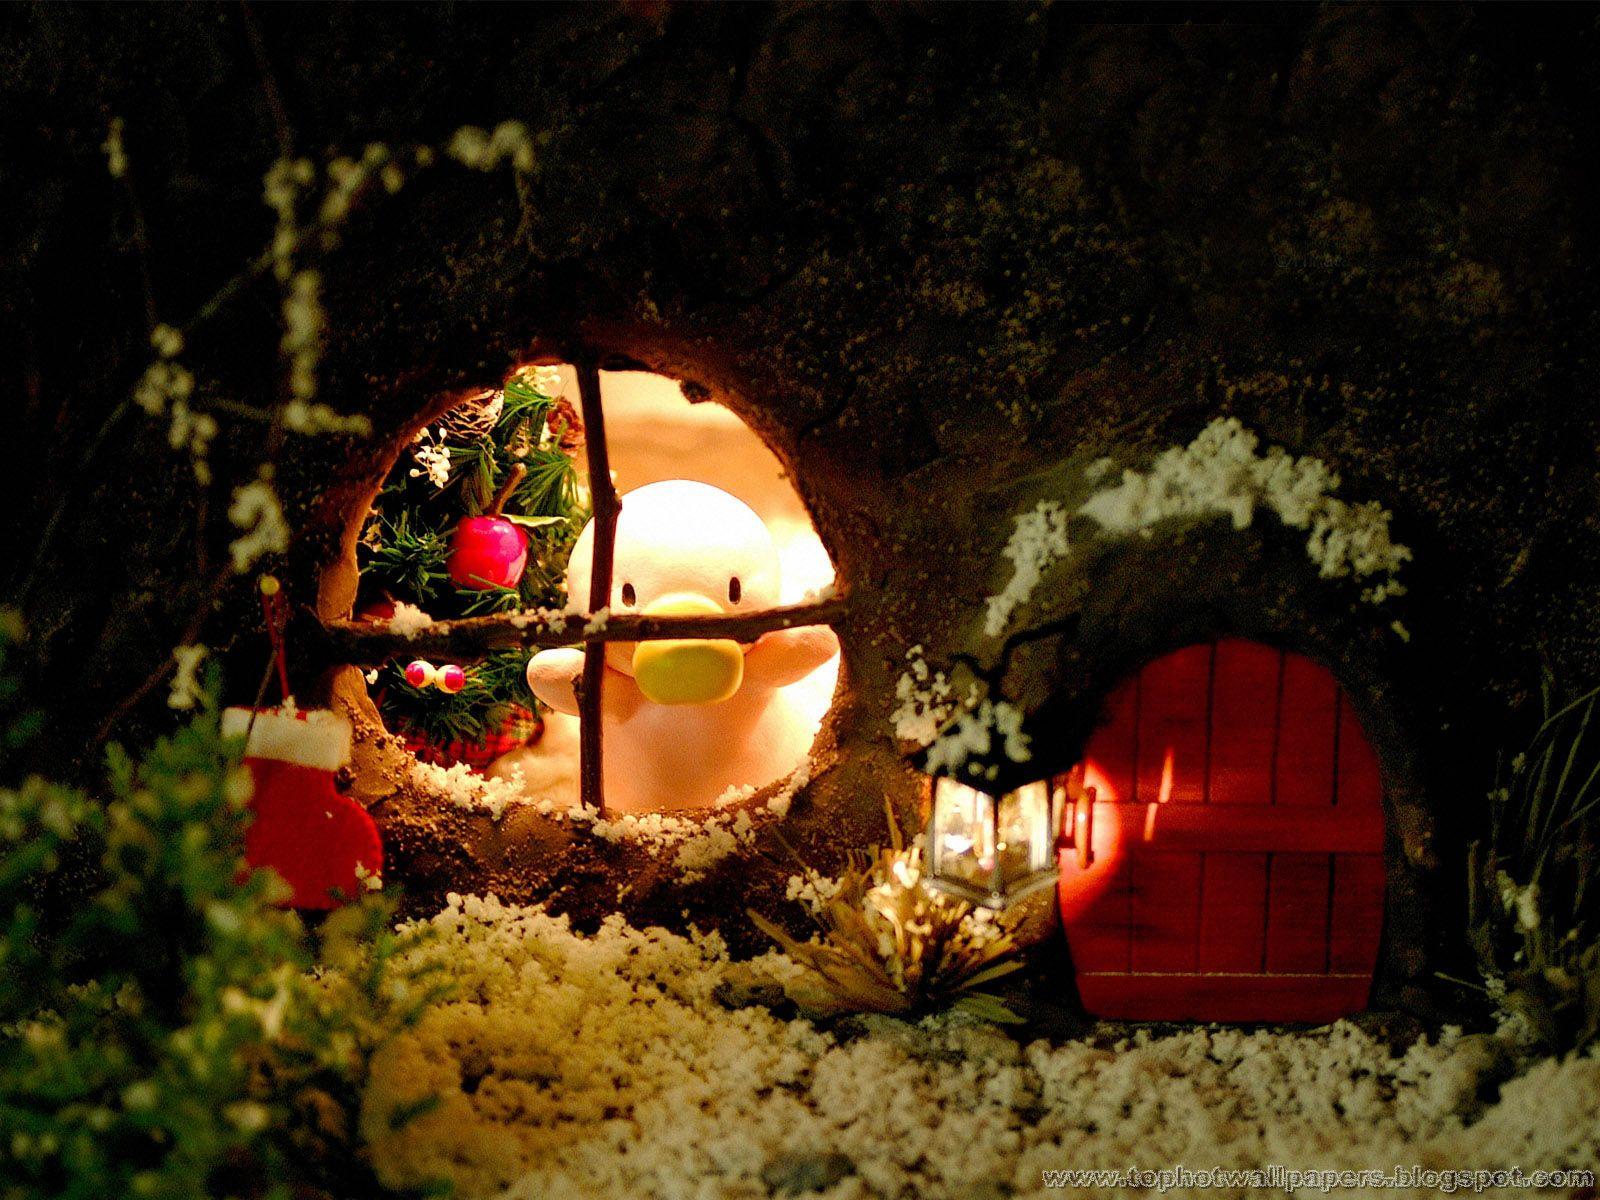 http://4.bp.blogspot.com/_-Cb_iV_LnpU/SUOrPaopzRI/AAAAAAAAHe0/Wmd8X0LAAUo/s1600/wallcoo.com_Christmas_wallpaper_christmas_photos_52207.jpg